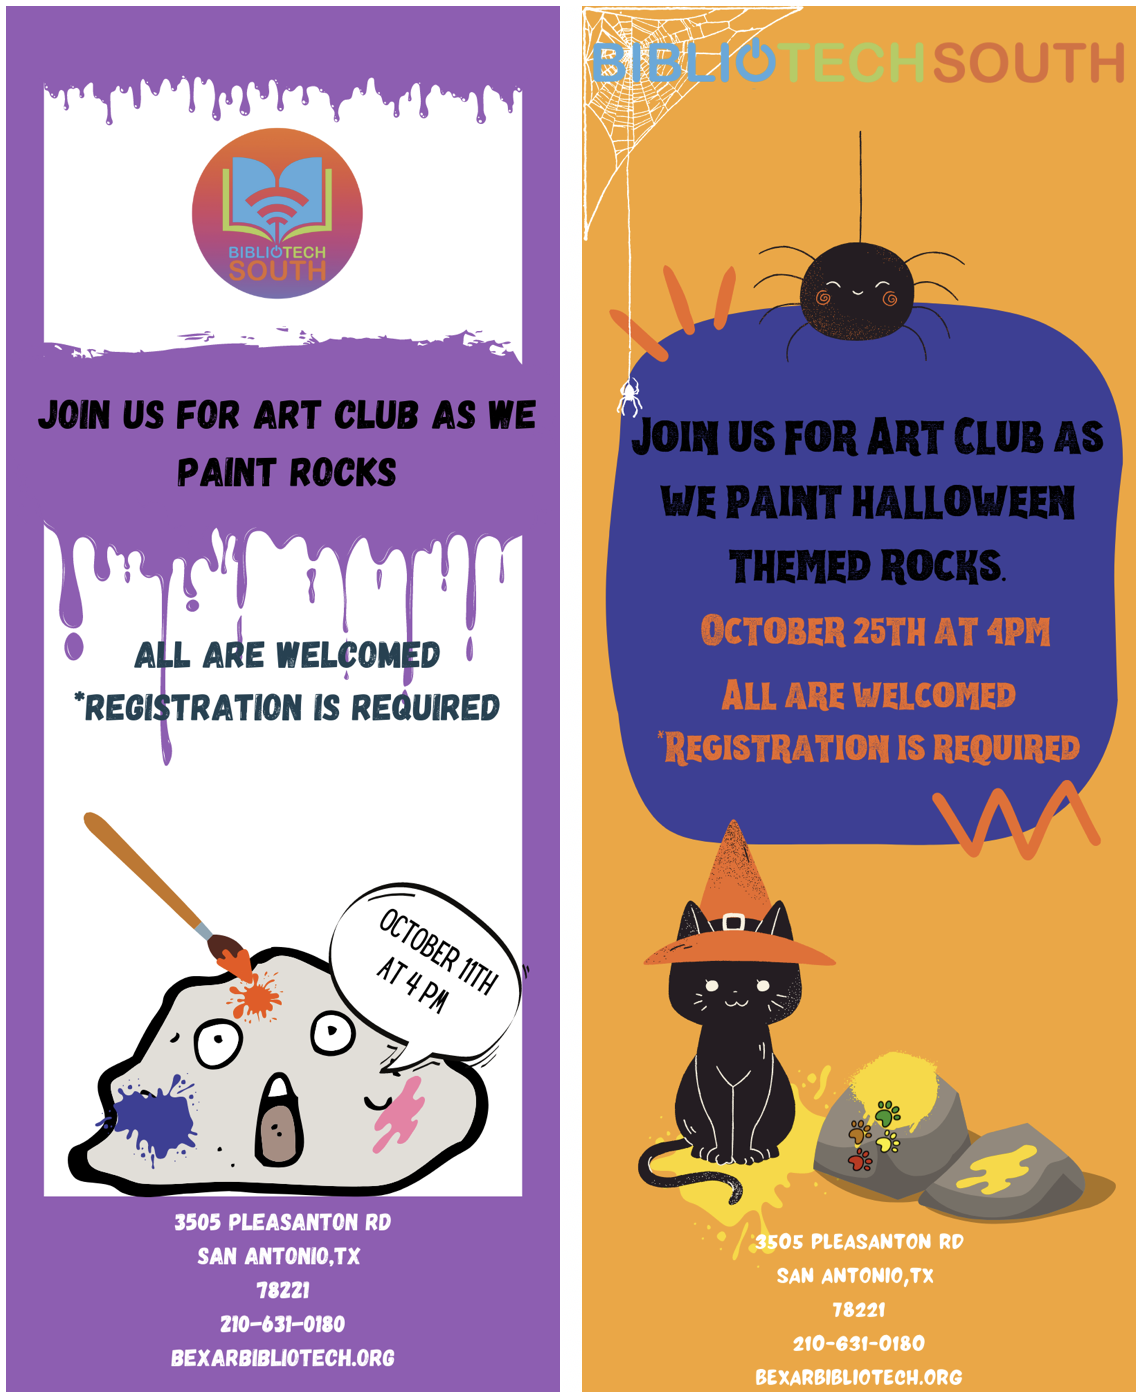 Art Club - South Branch